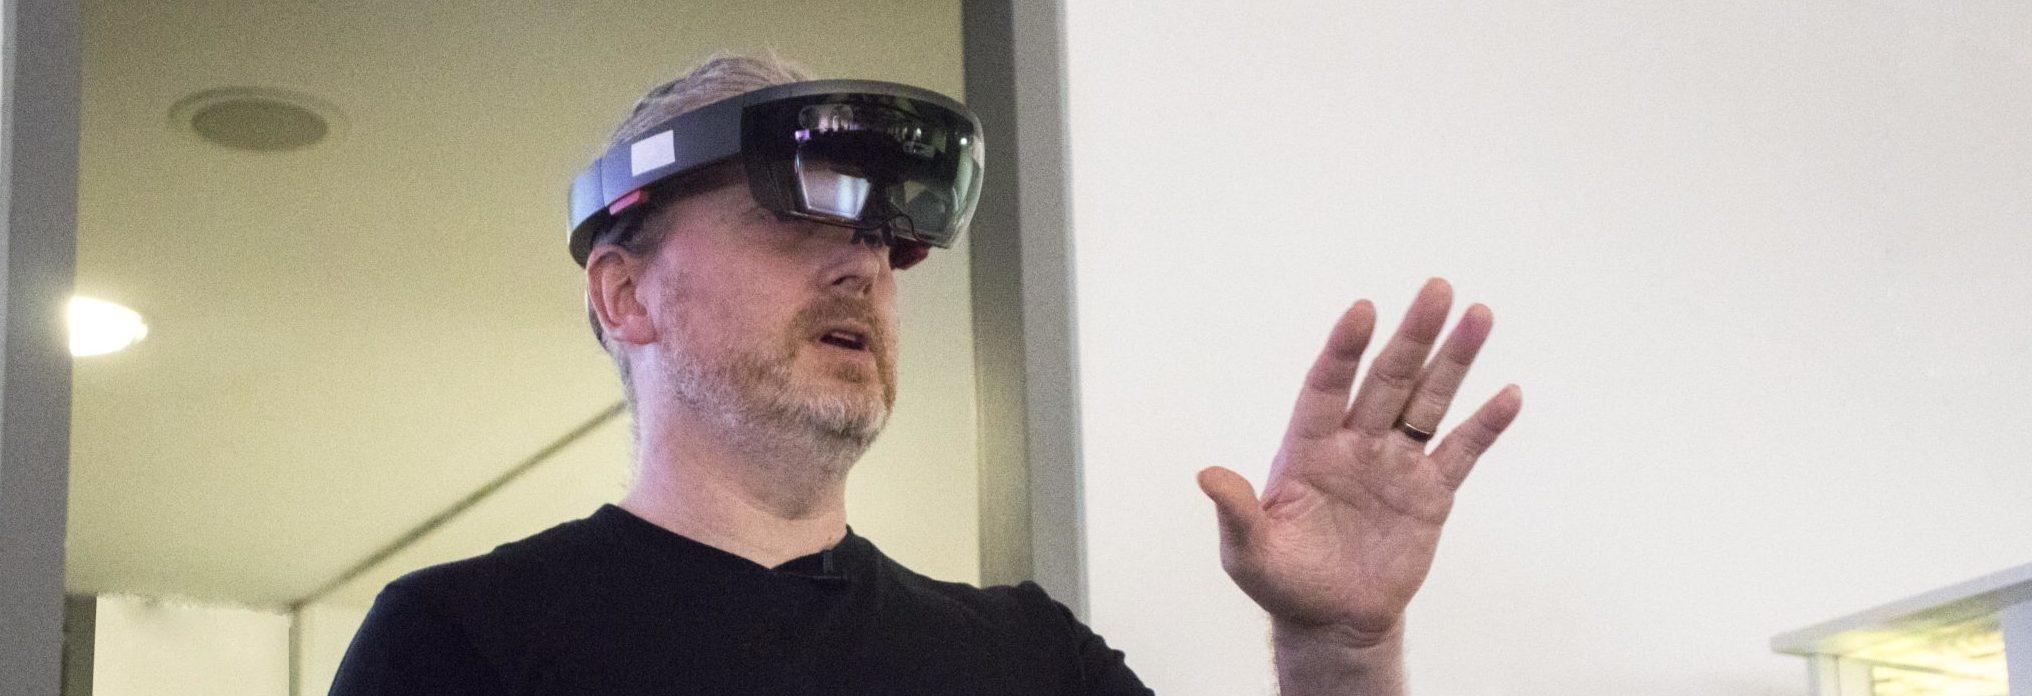 Tech Play Friday – Microsoft HoloLens